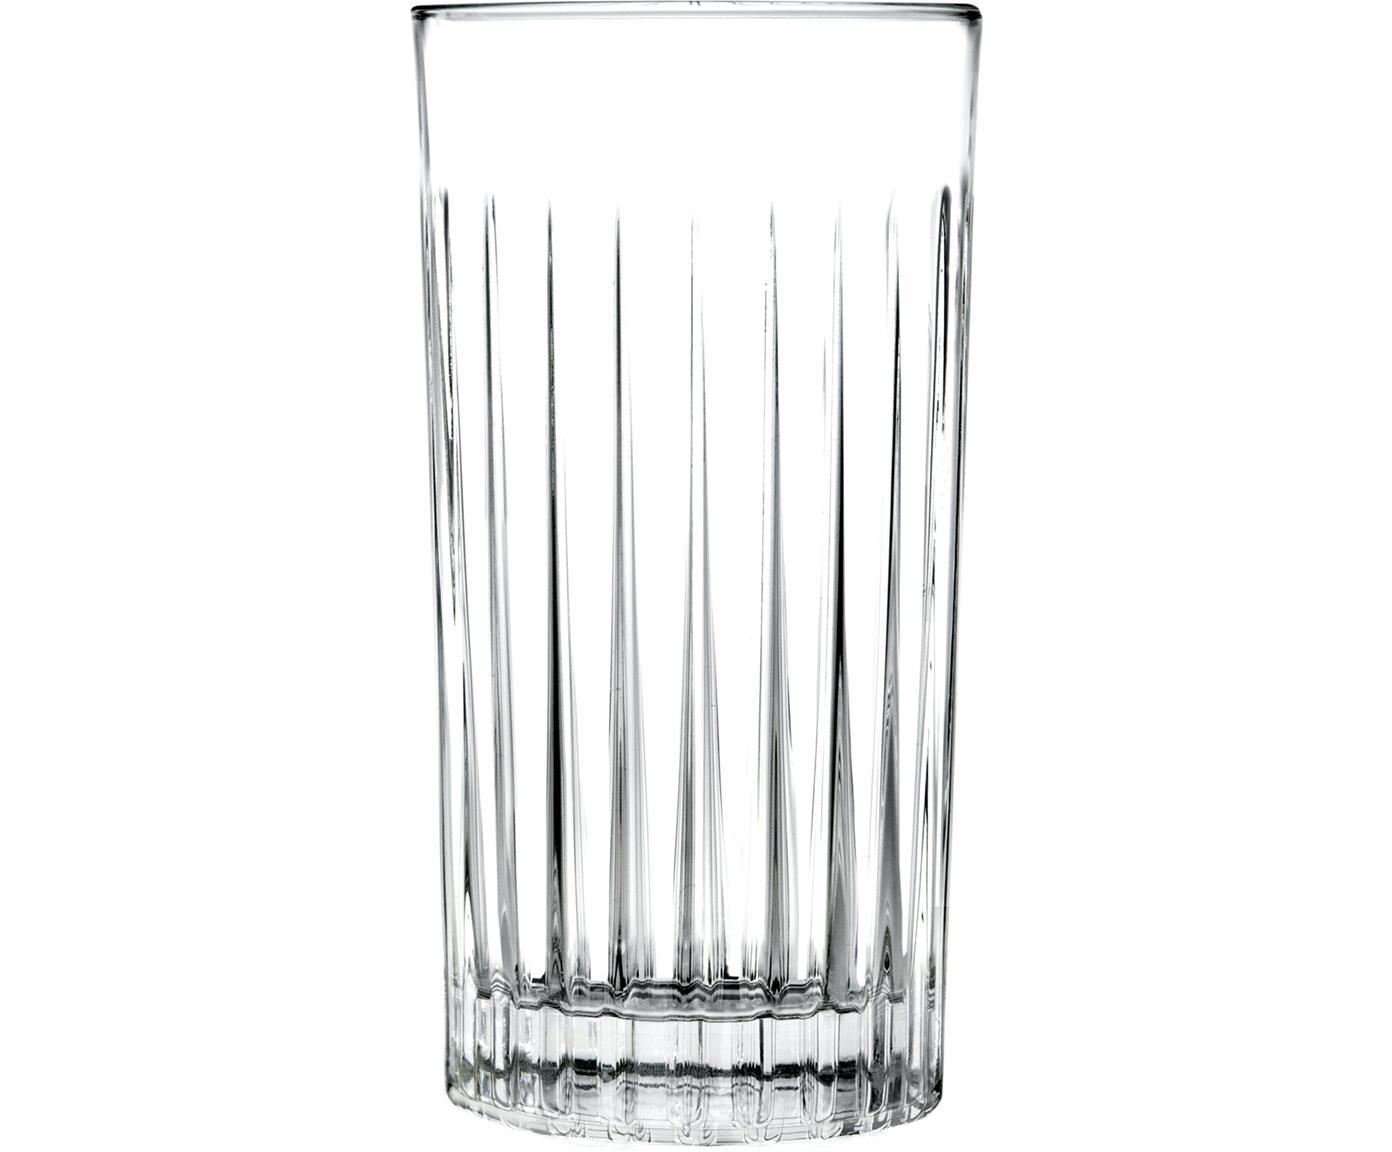 Kryształowa szklanka do koktajli Timeless, 6 szt., Szkło kryształowe, Transparentny, Ø 8 x W 15 cm